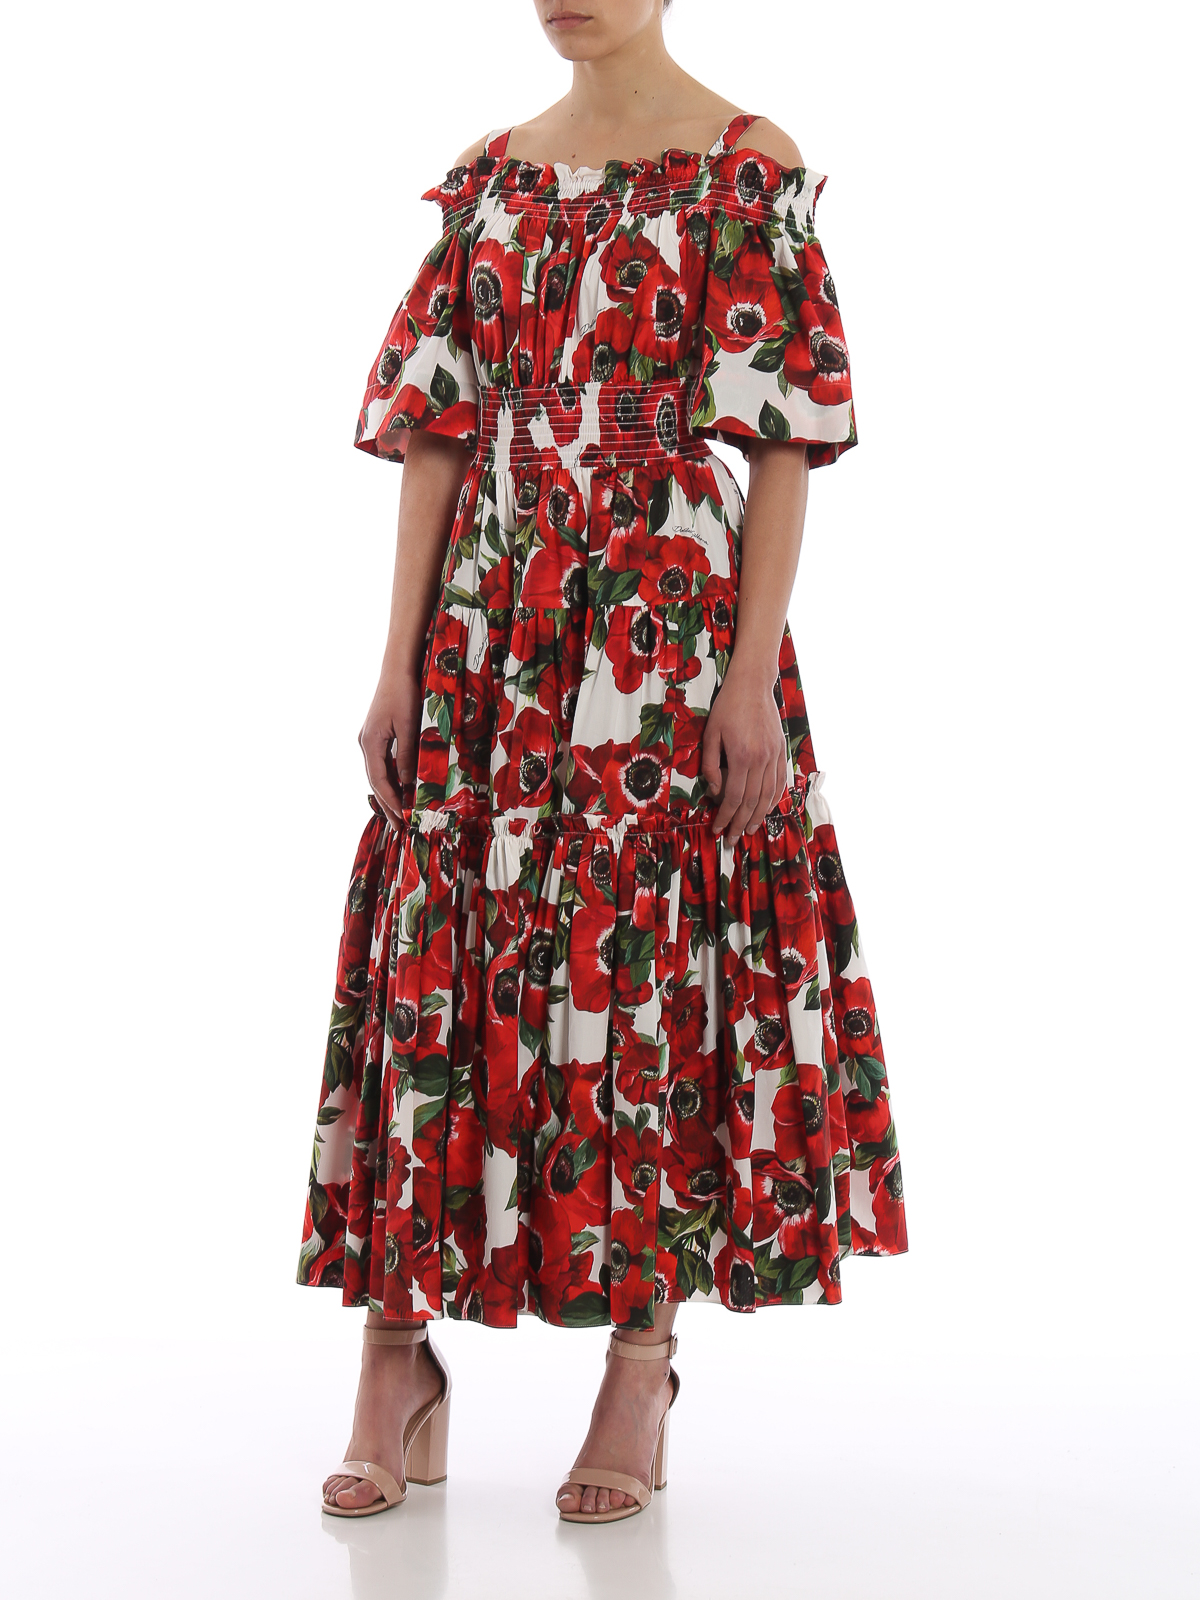 dolce and gabbana dress,dolce and gabbana dress,dolce and gabbana dress,dolce and gabbana dress,